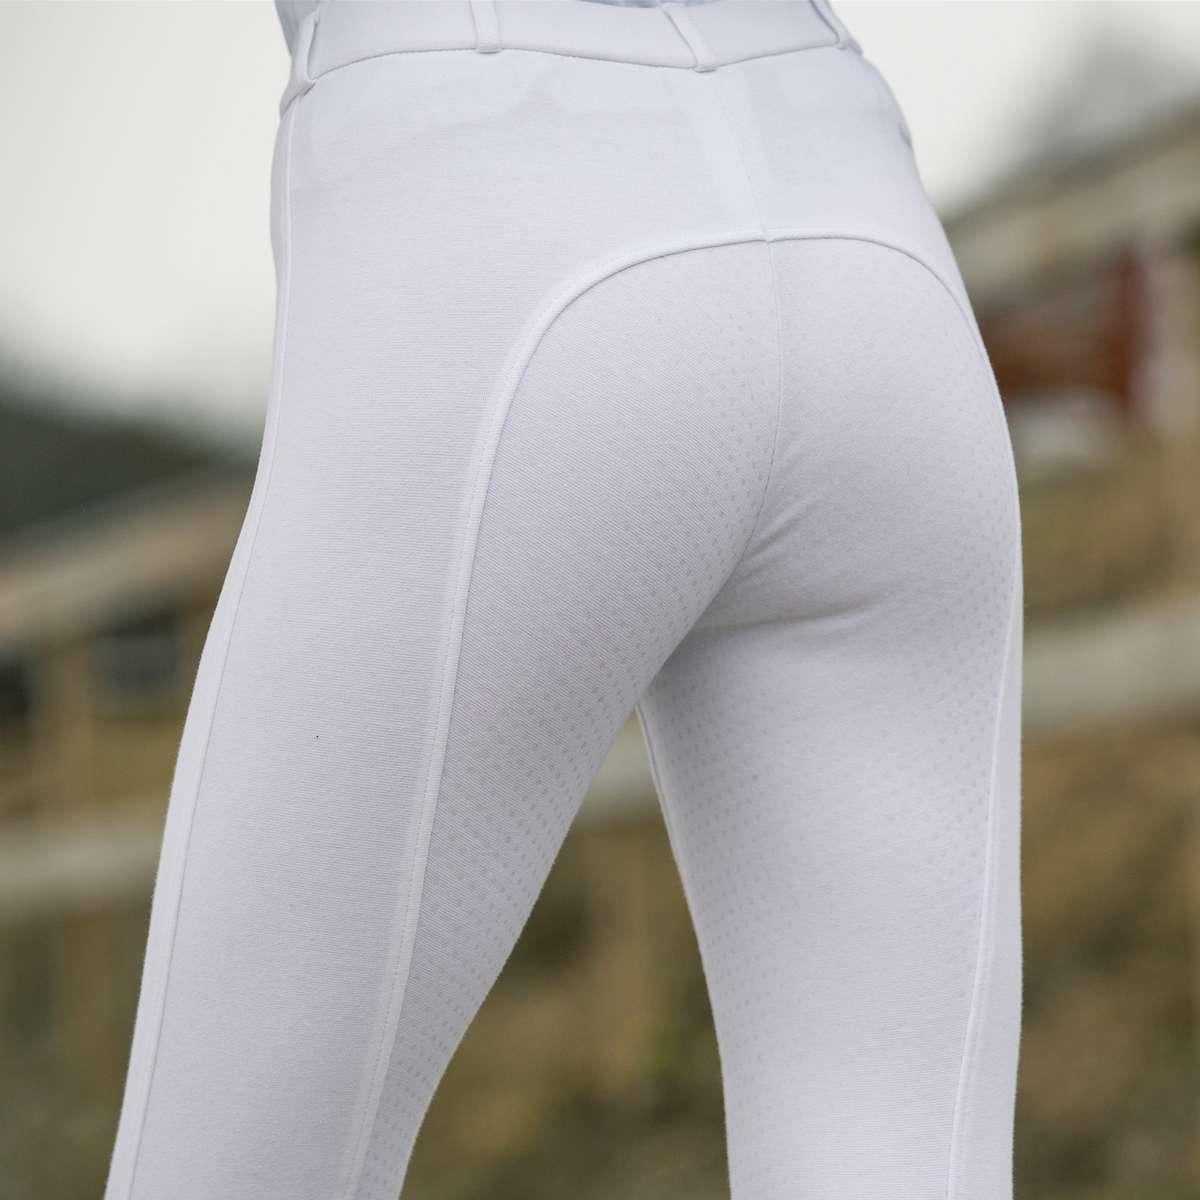 Horze-Women-039-s-Active-Silicone-Grip-Full-Seat-Riding-Breeches-Elastic-Leg-Bottoms thumbnail 20